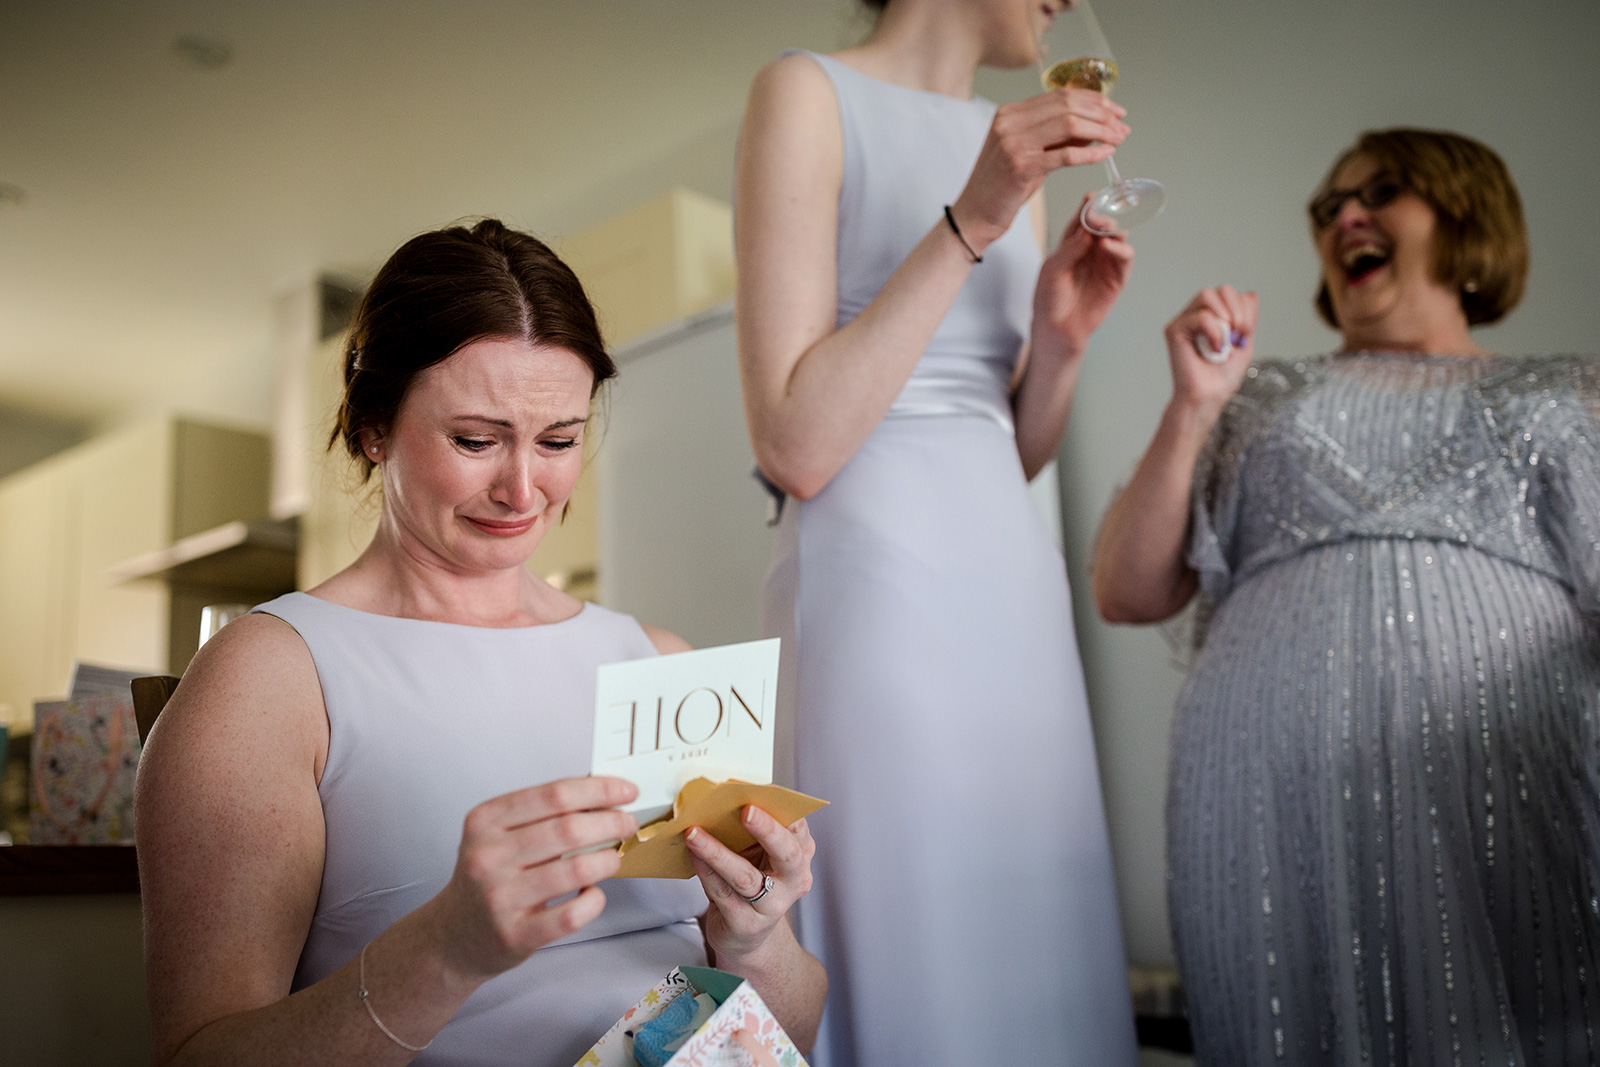 Bridesmaids during the bridal prep